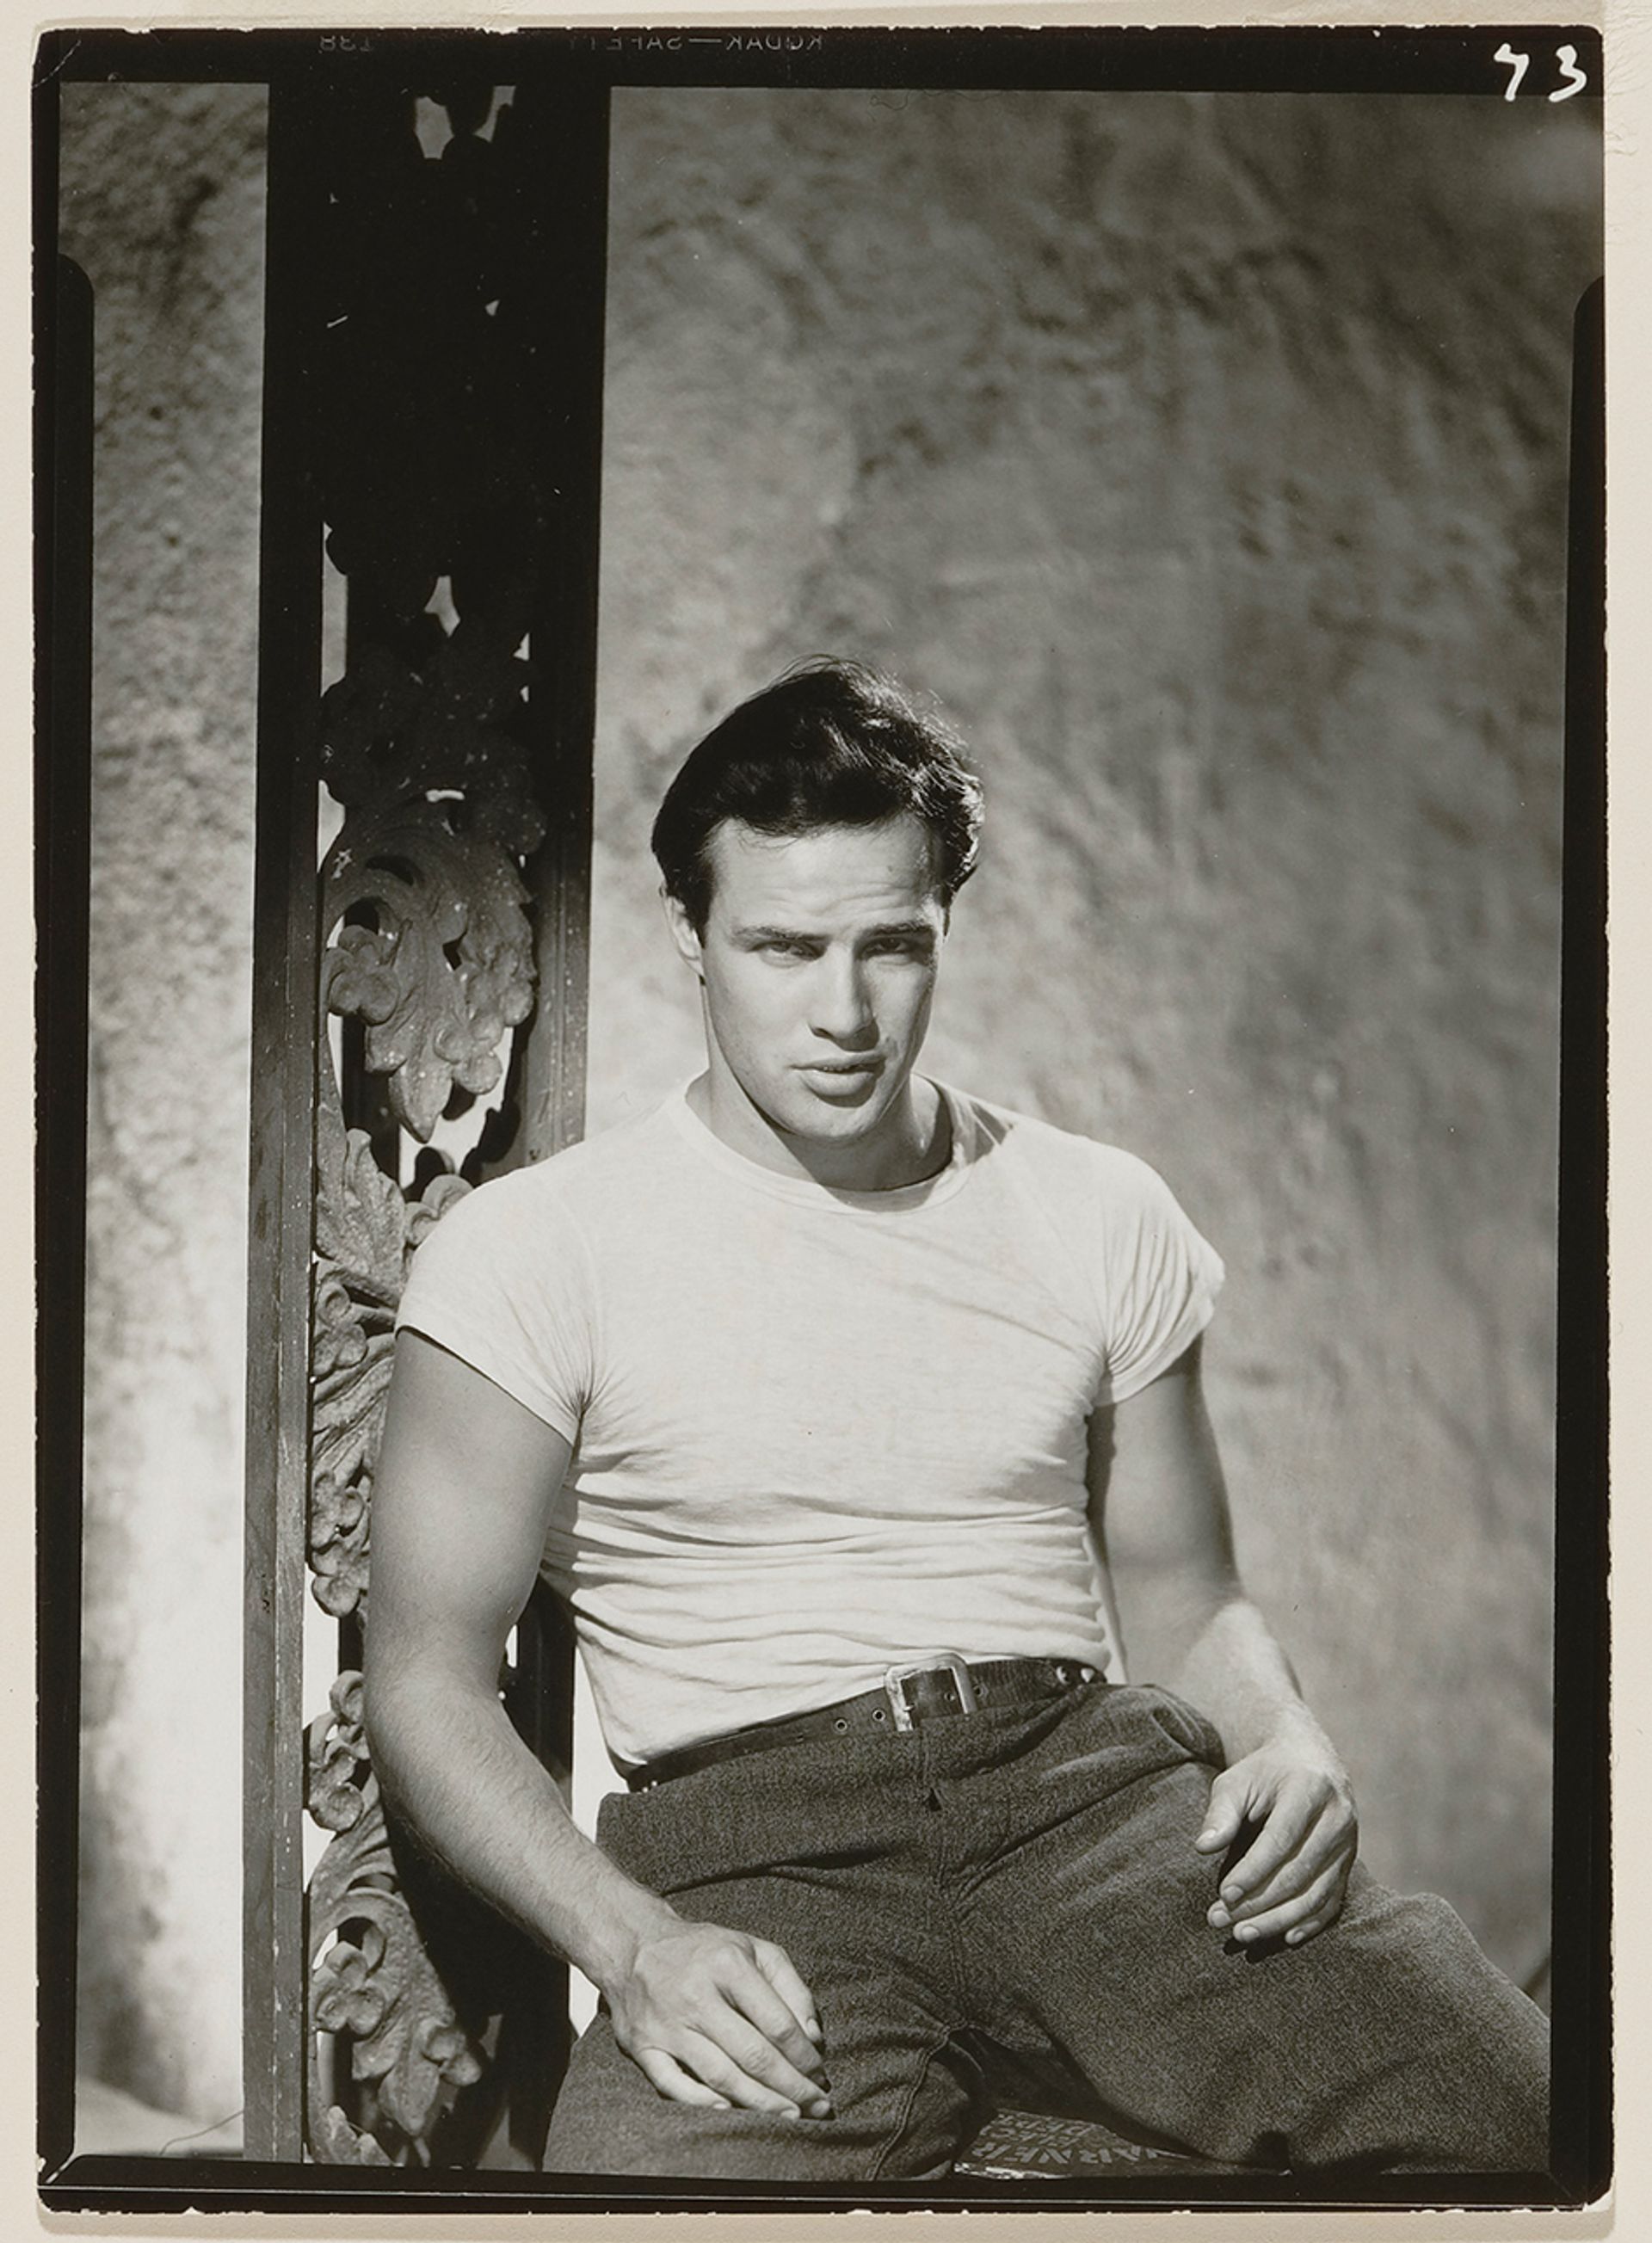 John Engstead's photograph of Marlon Brando in 1950 Photo by Jeffrey Nintzel of original by John Engstead